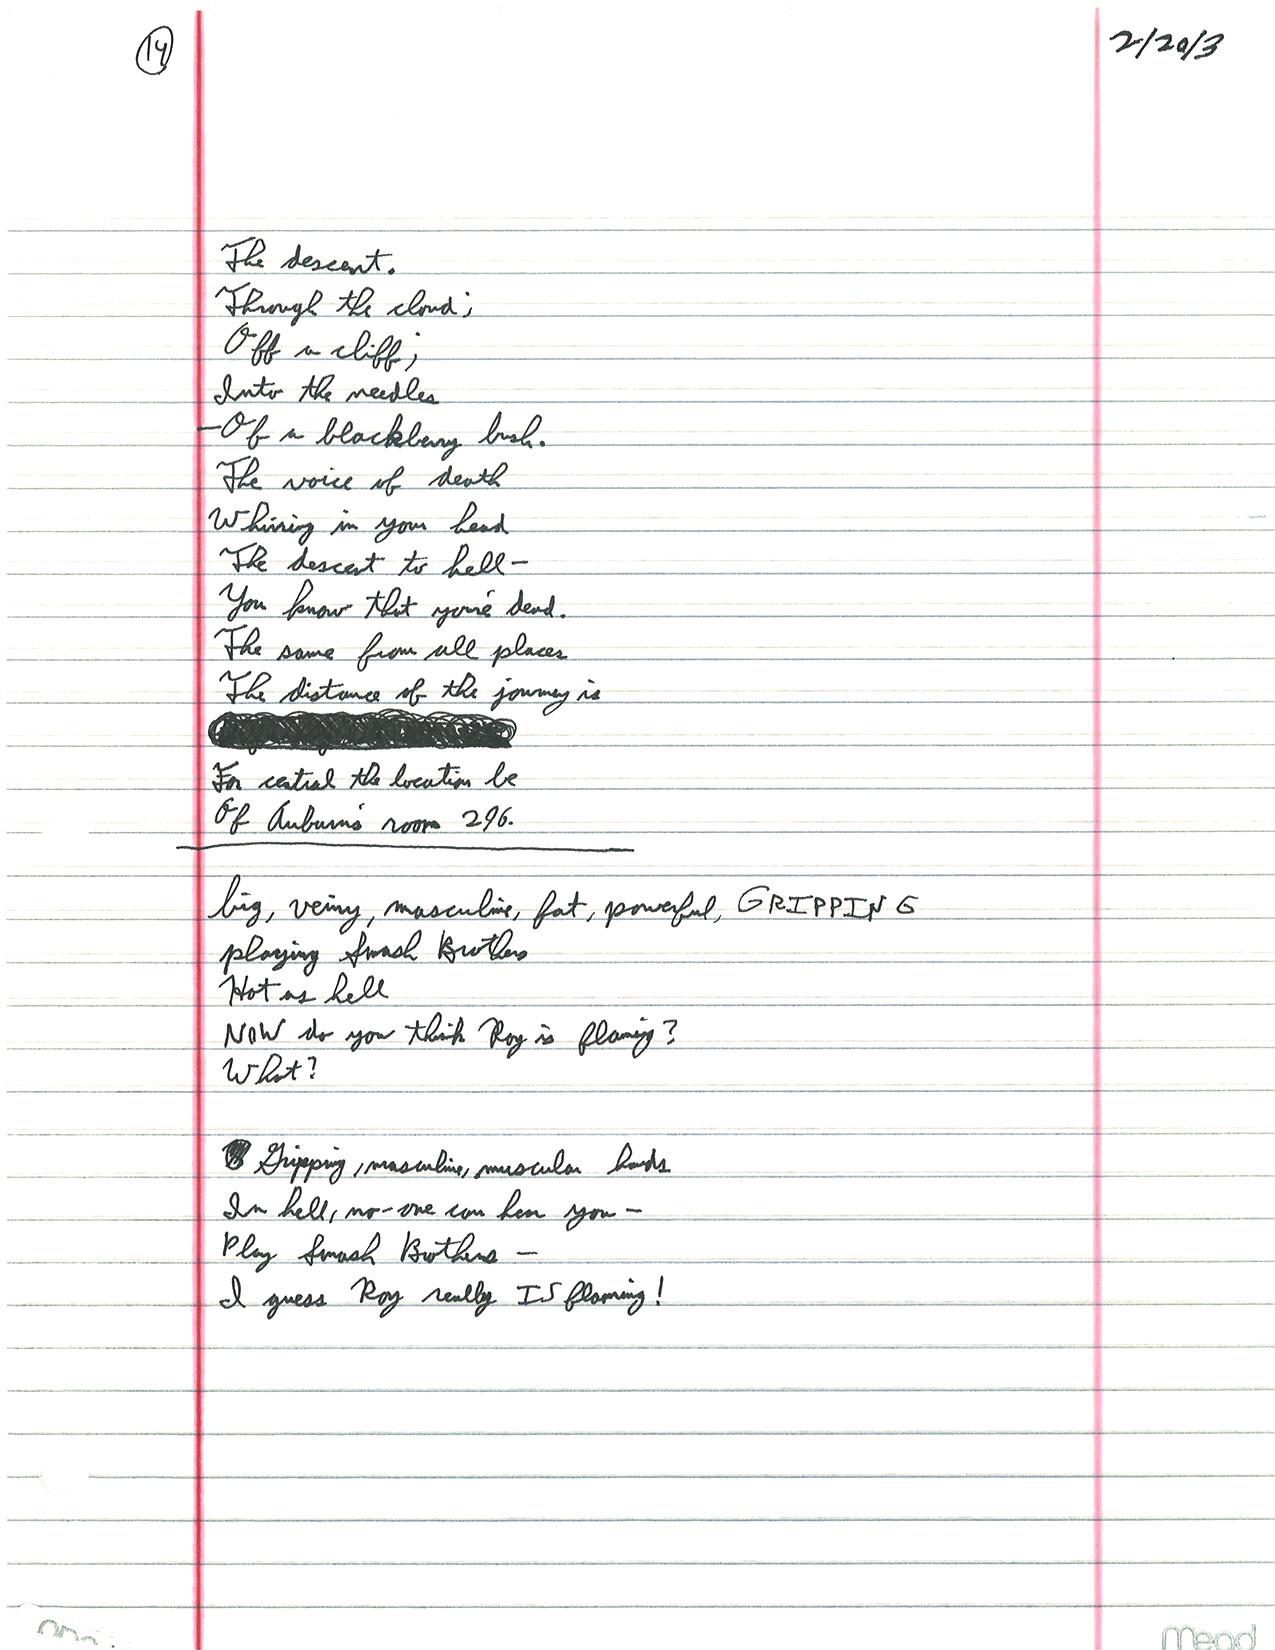 math worksheet : february  2013  cody gough dot   : Poems For High School Class Reunions